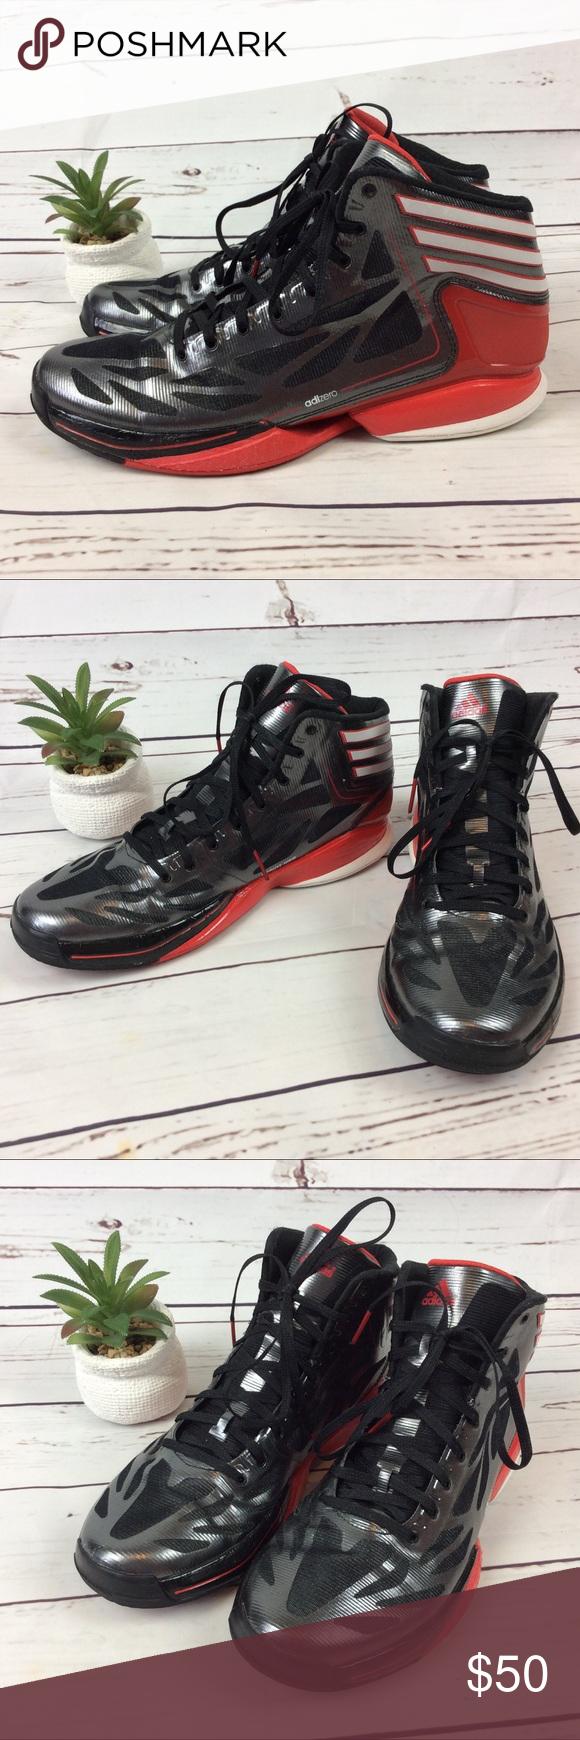 Adidas Adizero SprintWeb Basketball